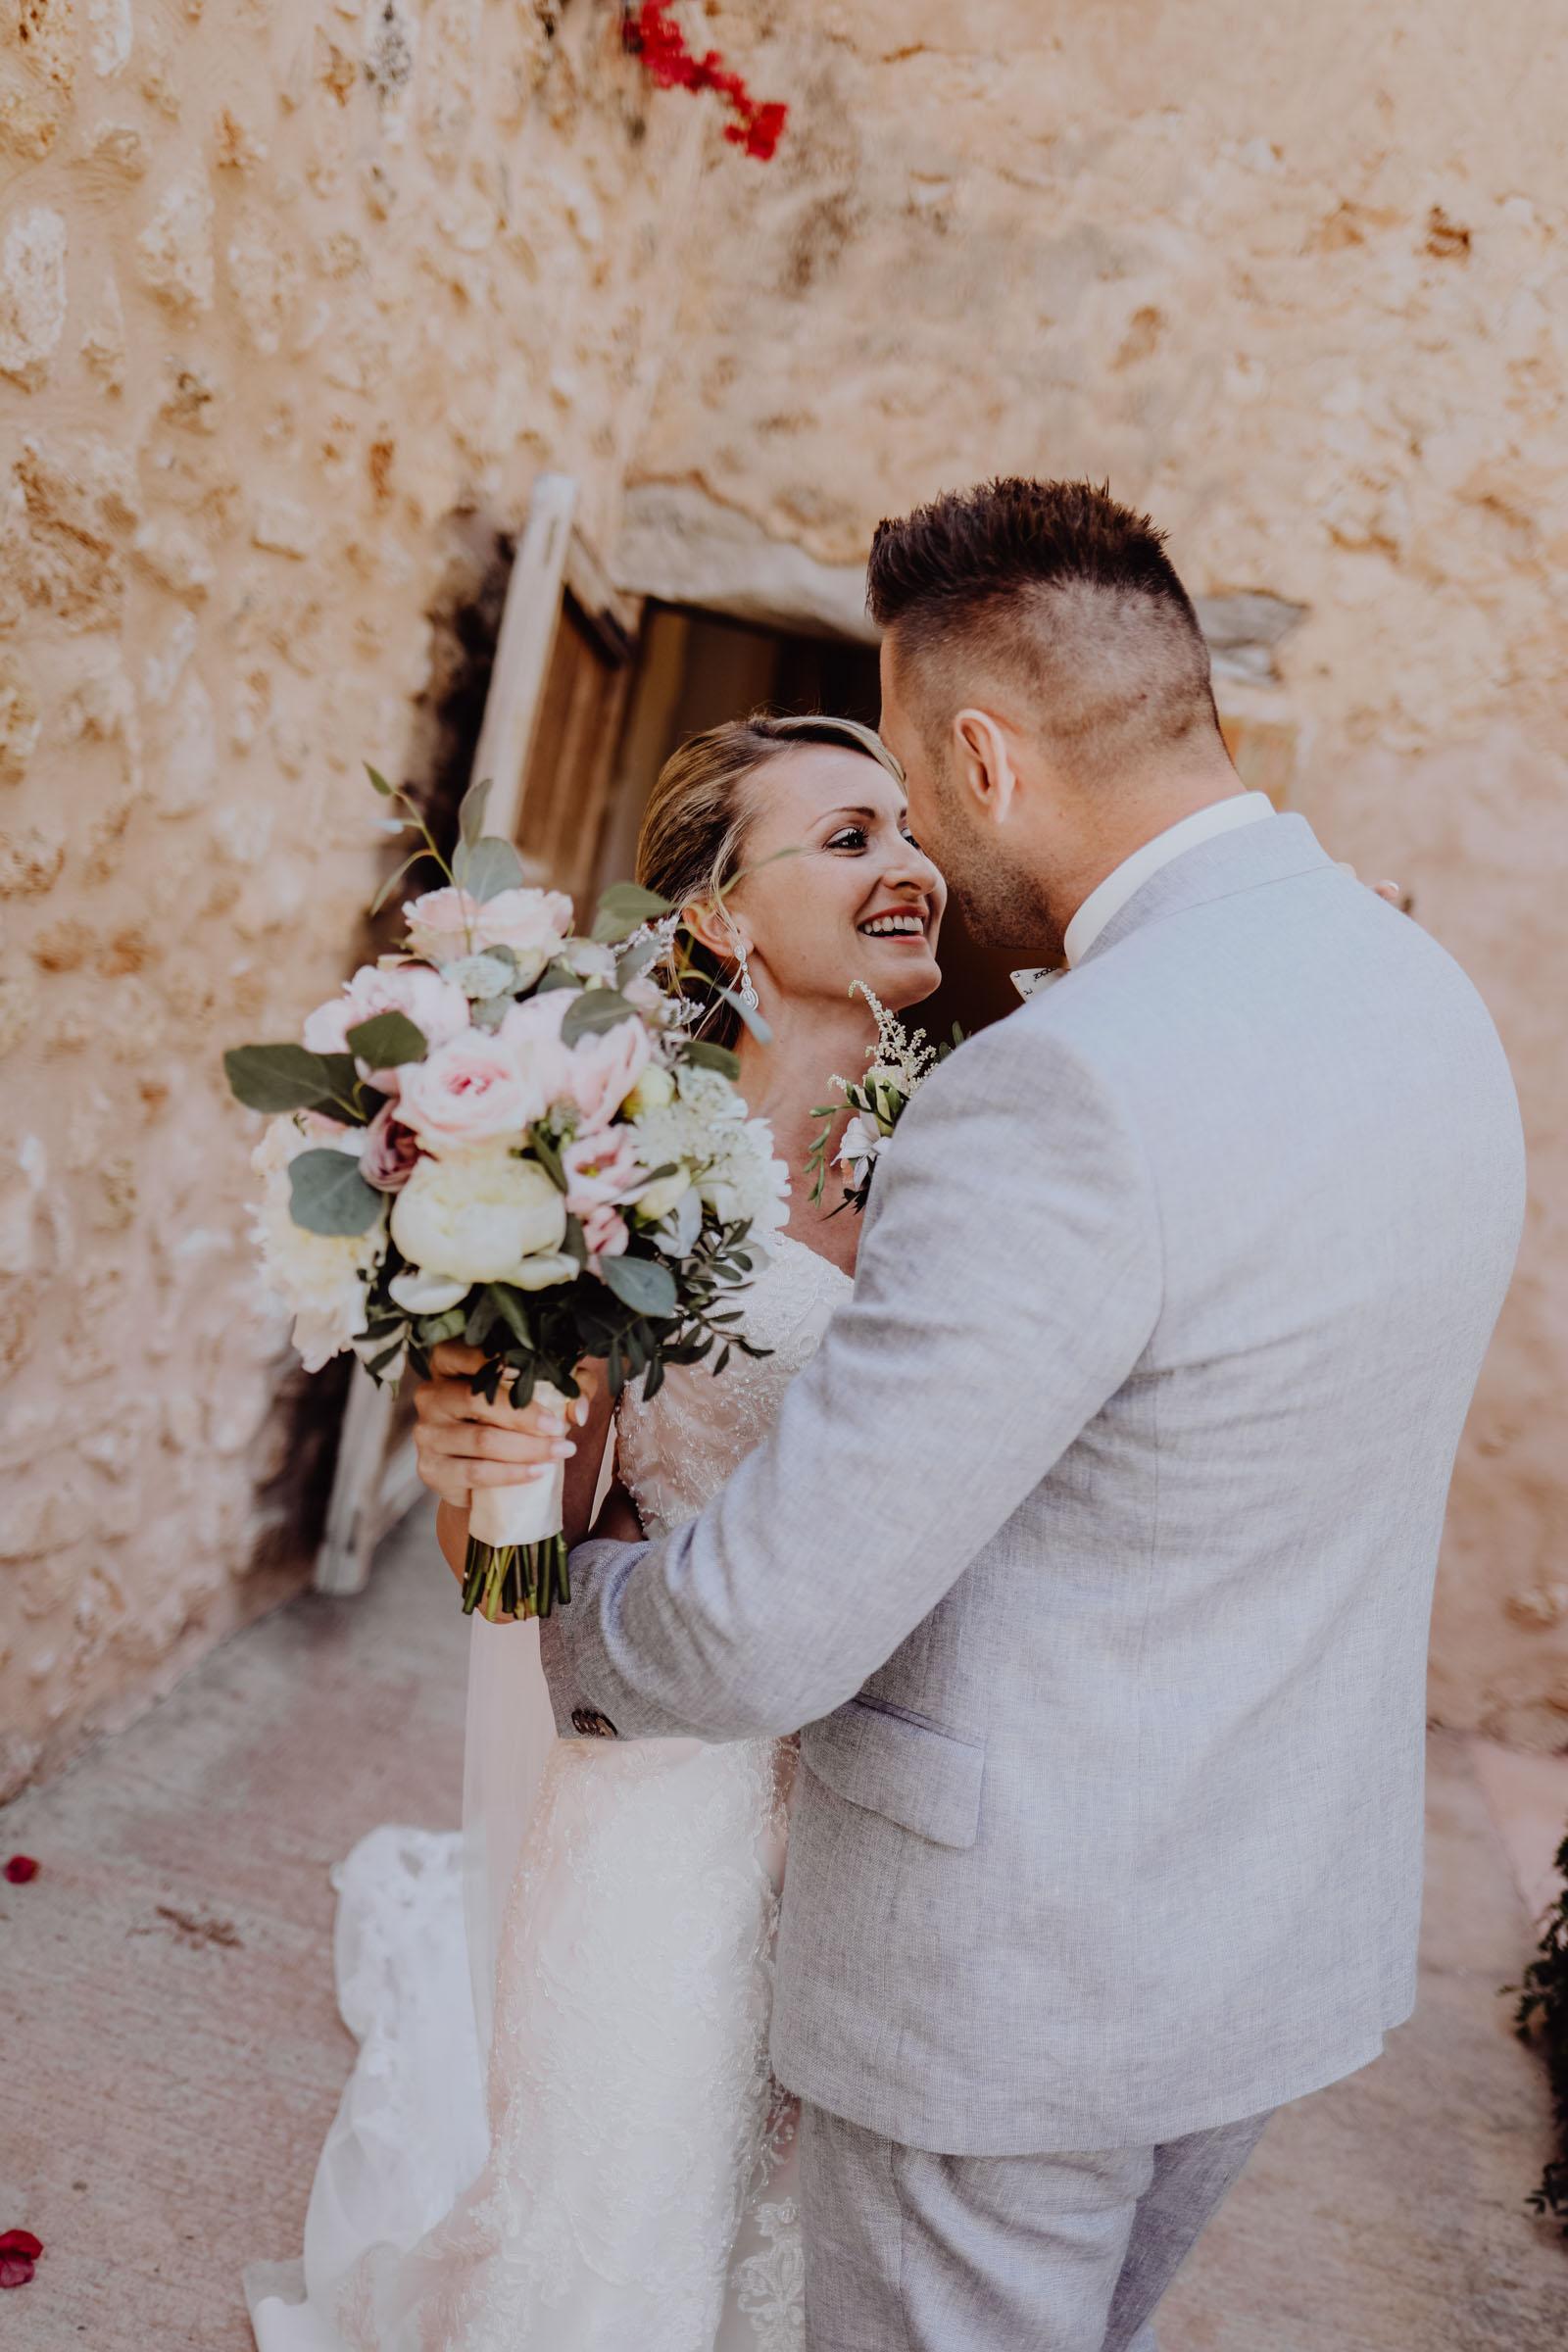 Braut mit Brautstrauß küsst Bräutigam